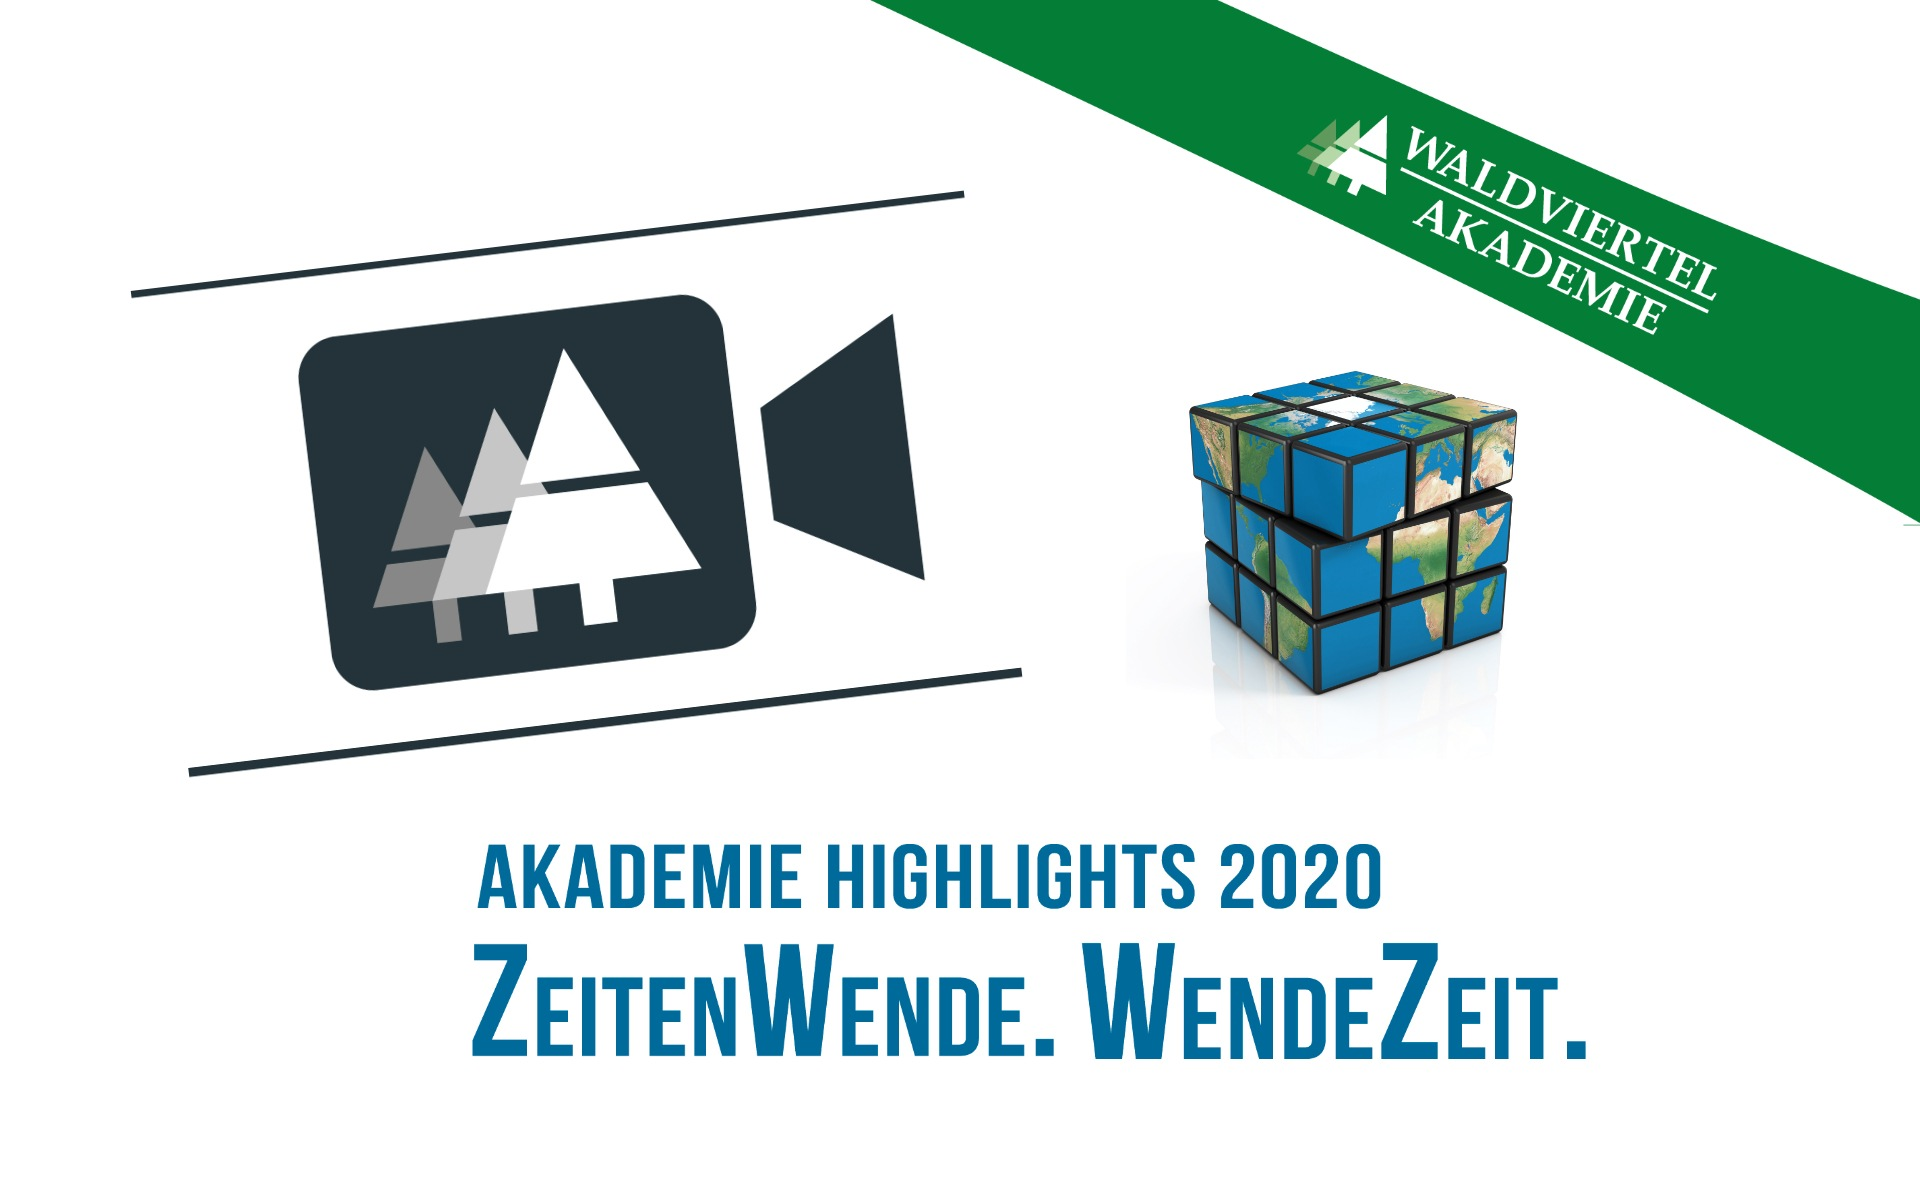 AKADEMIE-Highlights 2020 1